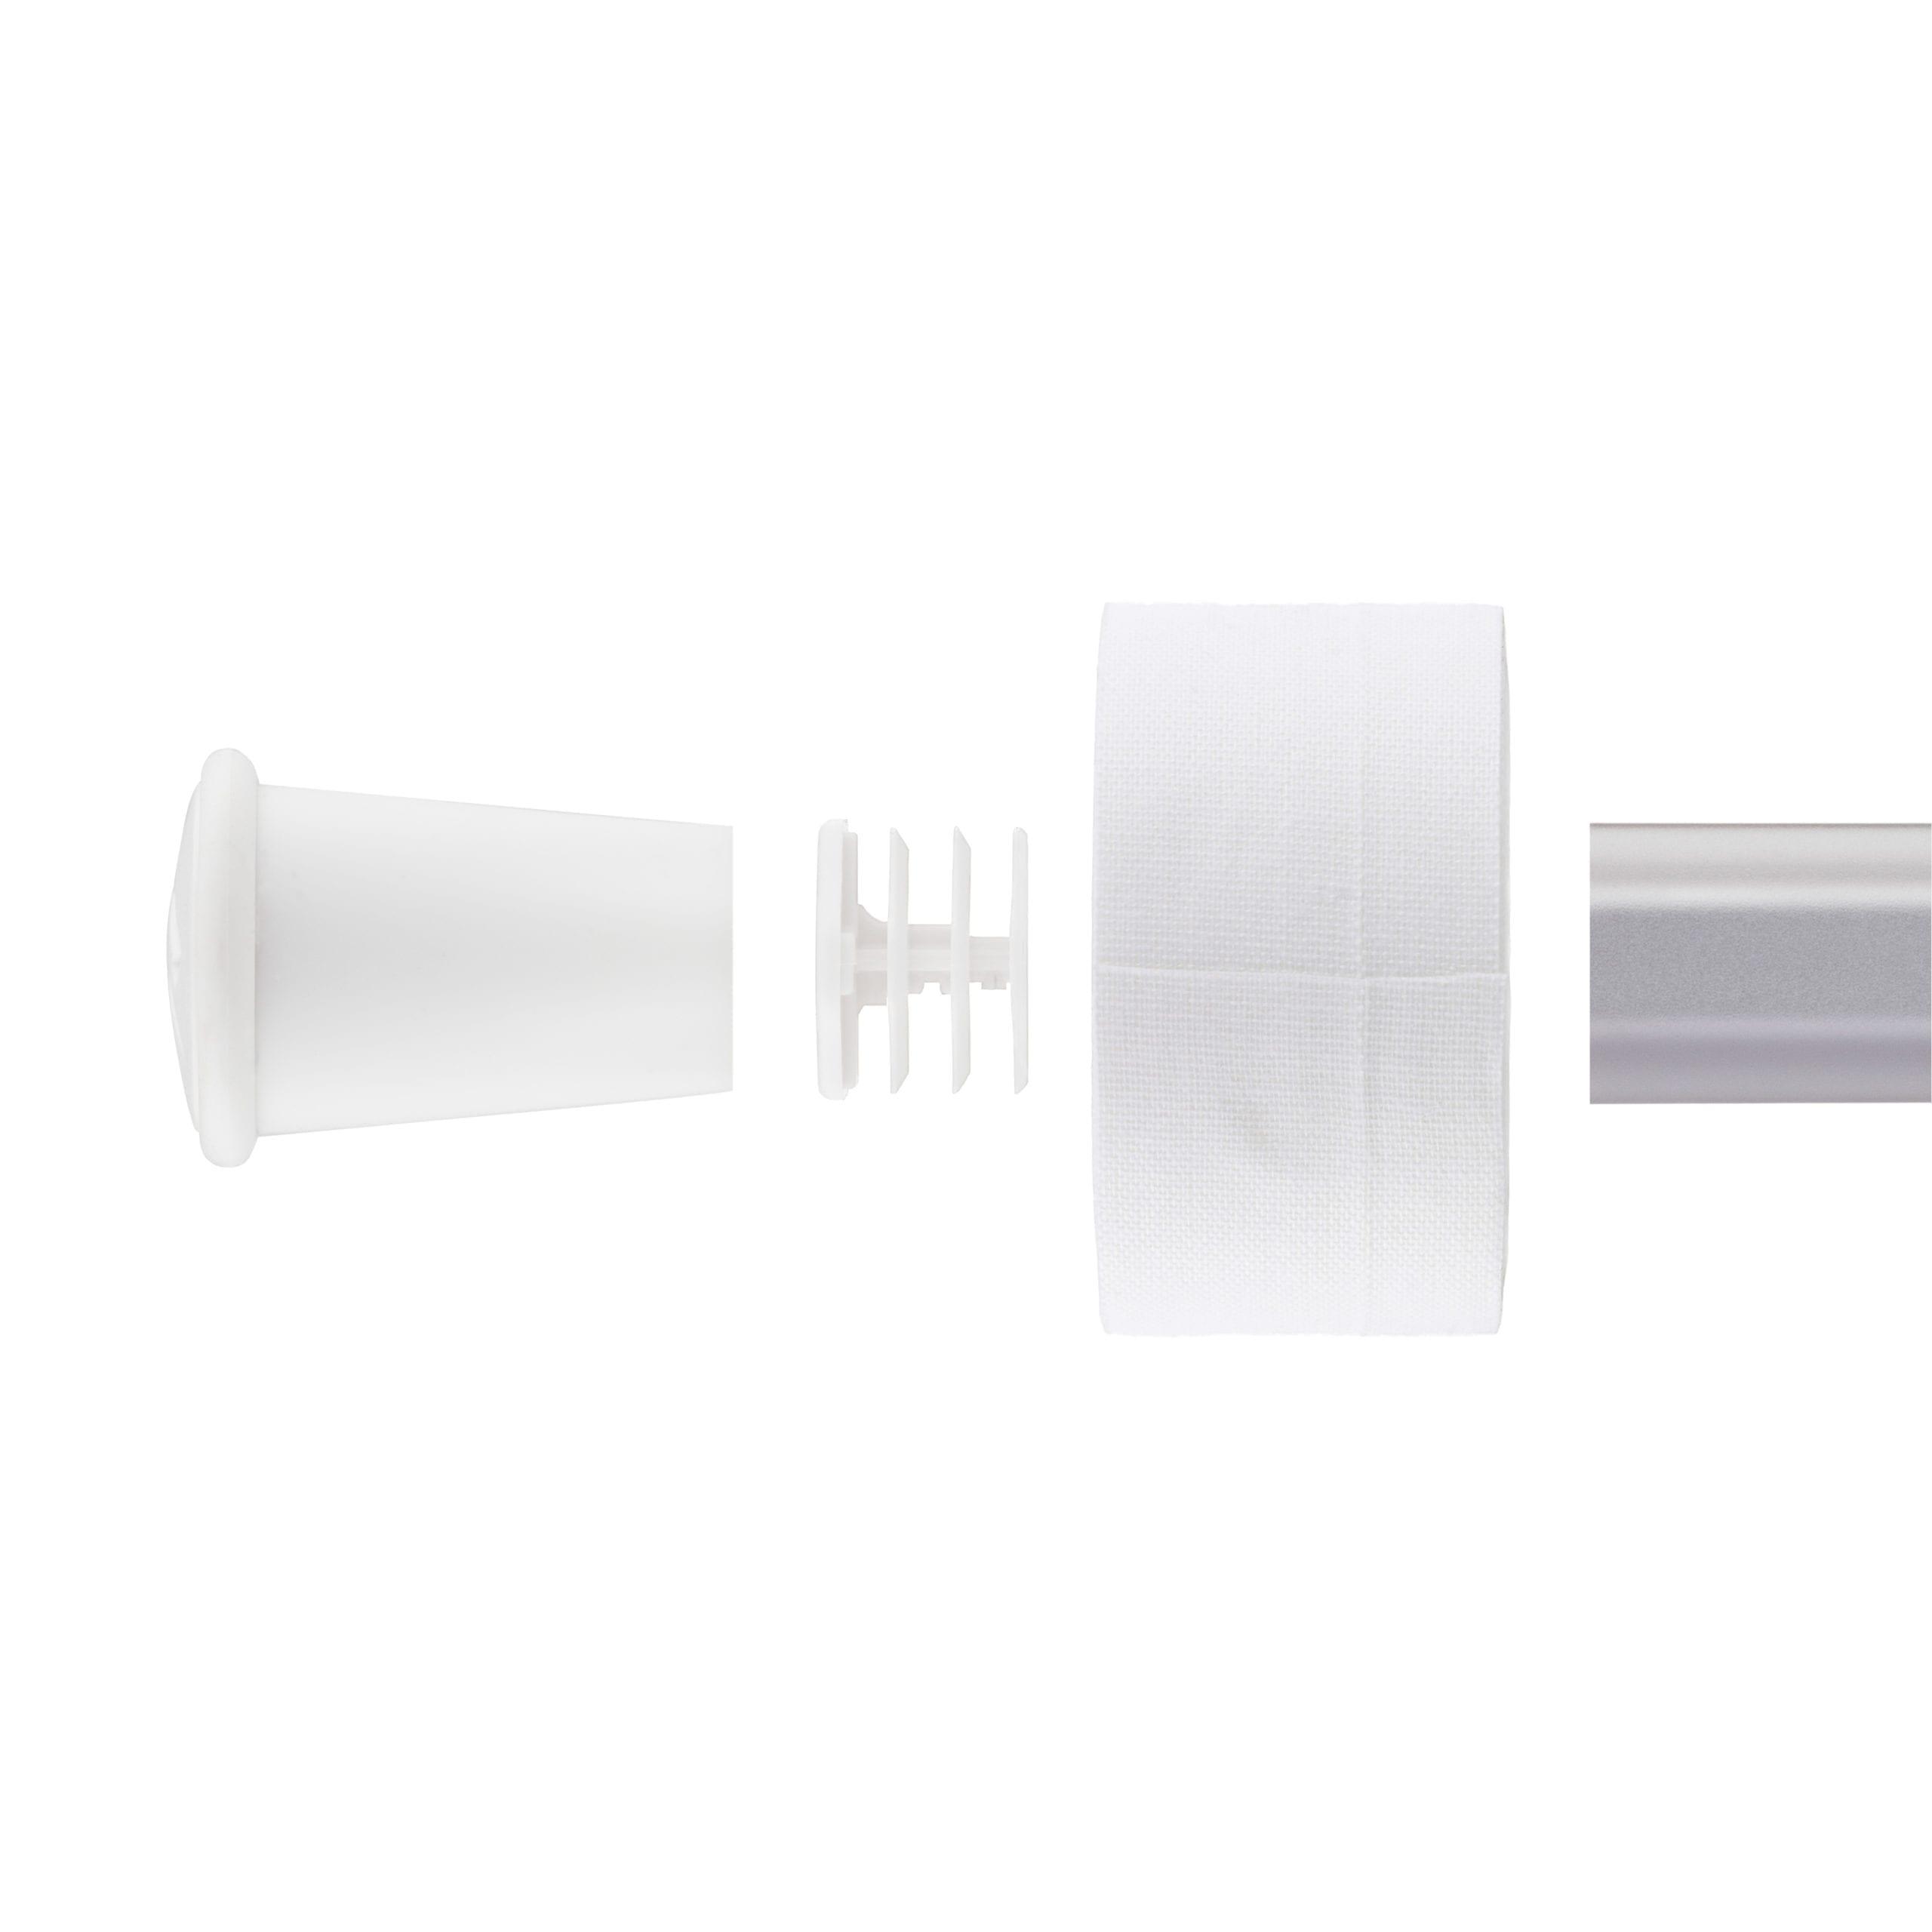 StringKing-Metal-3-Pro-Lacrosse-Shaft-Silver-Accessories-scaled-1.jpg